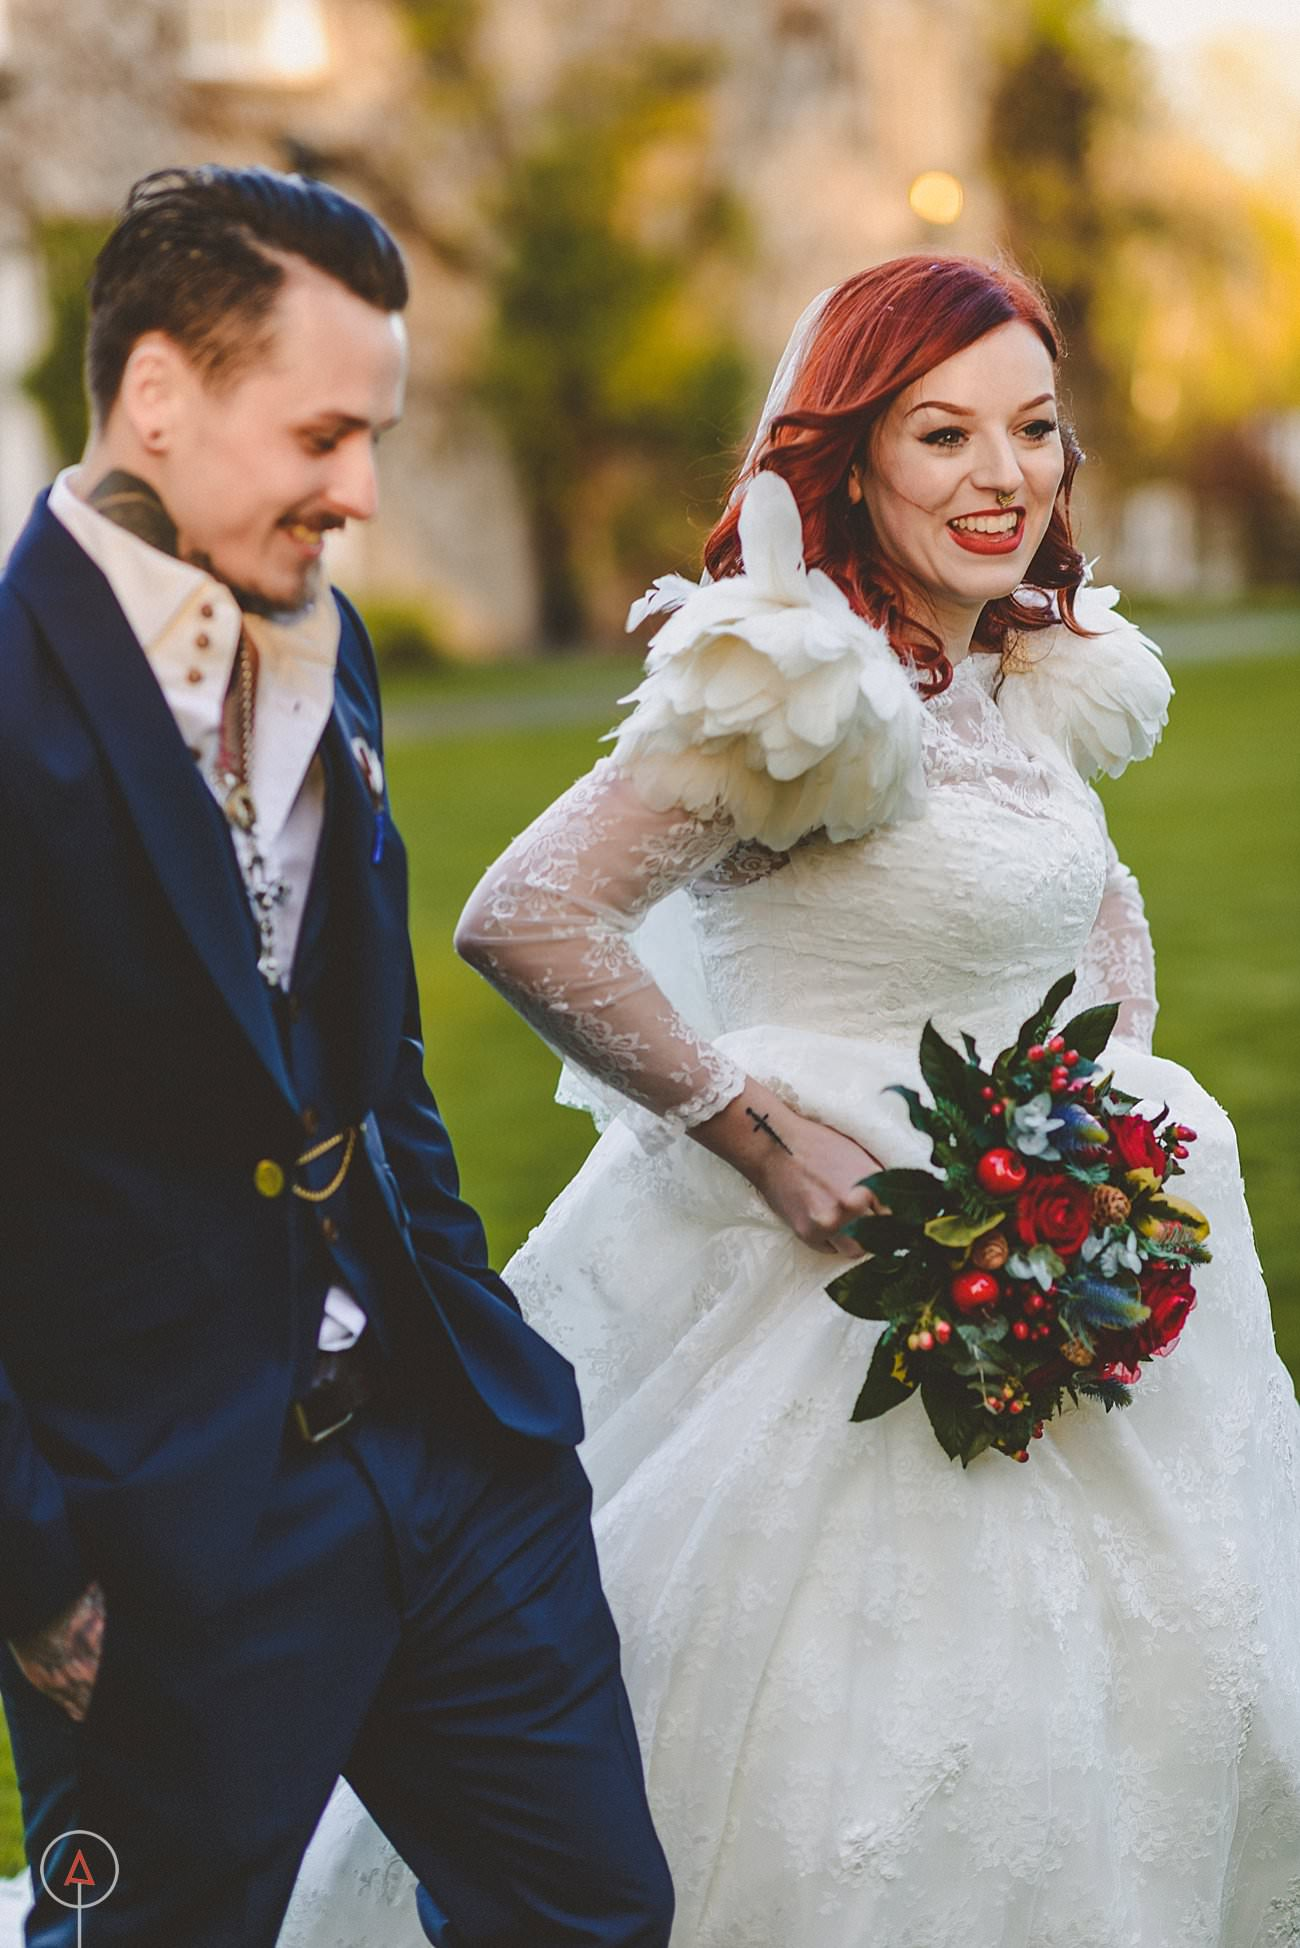 fonmon-castle-wedding-photographer-Cardiff_0208